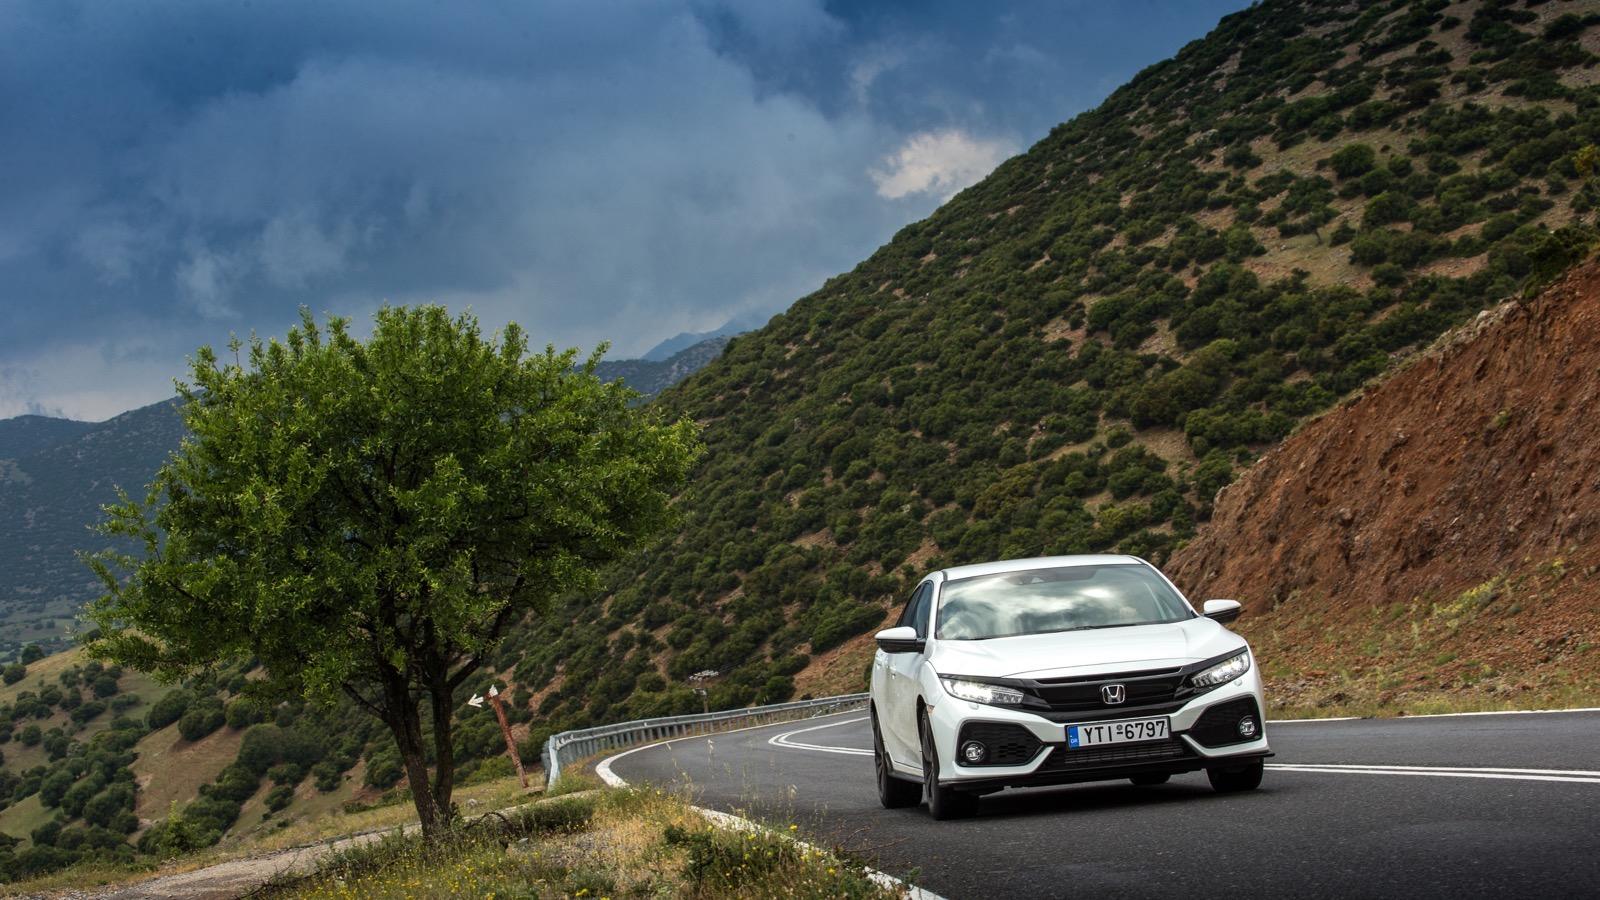 New_Honda_Civic_First_Drive_143